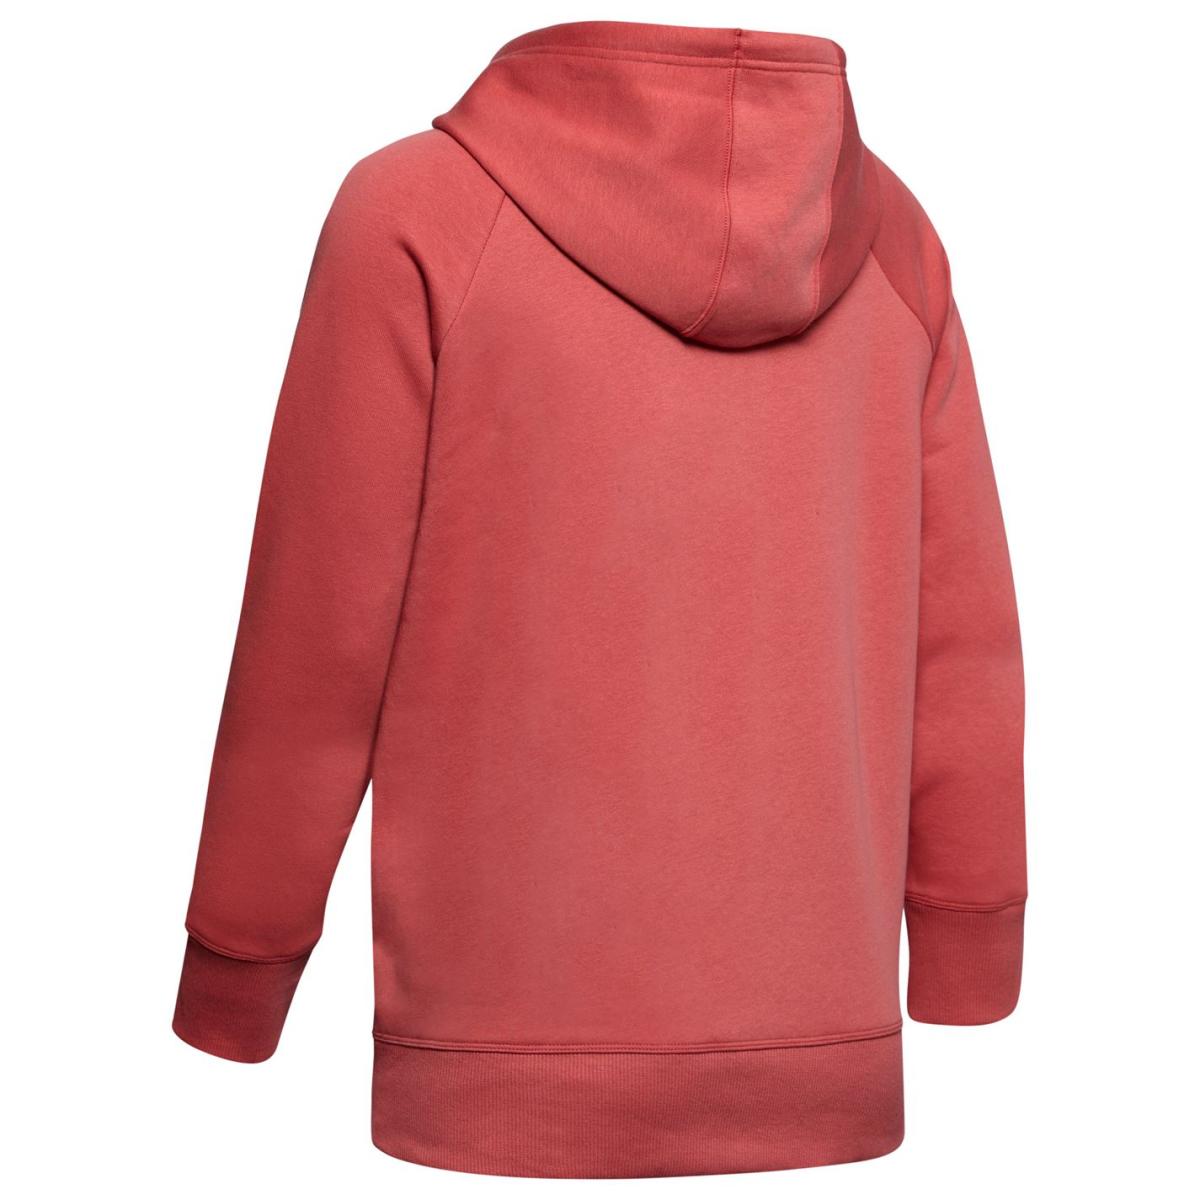 Under Armour Kapuzenpullover Sweatshirt Pullover Damen Kapuzenjacke Hoodie OTH 5